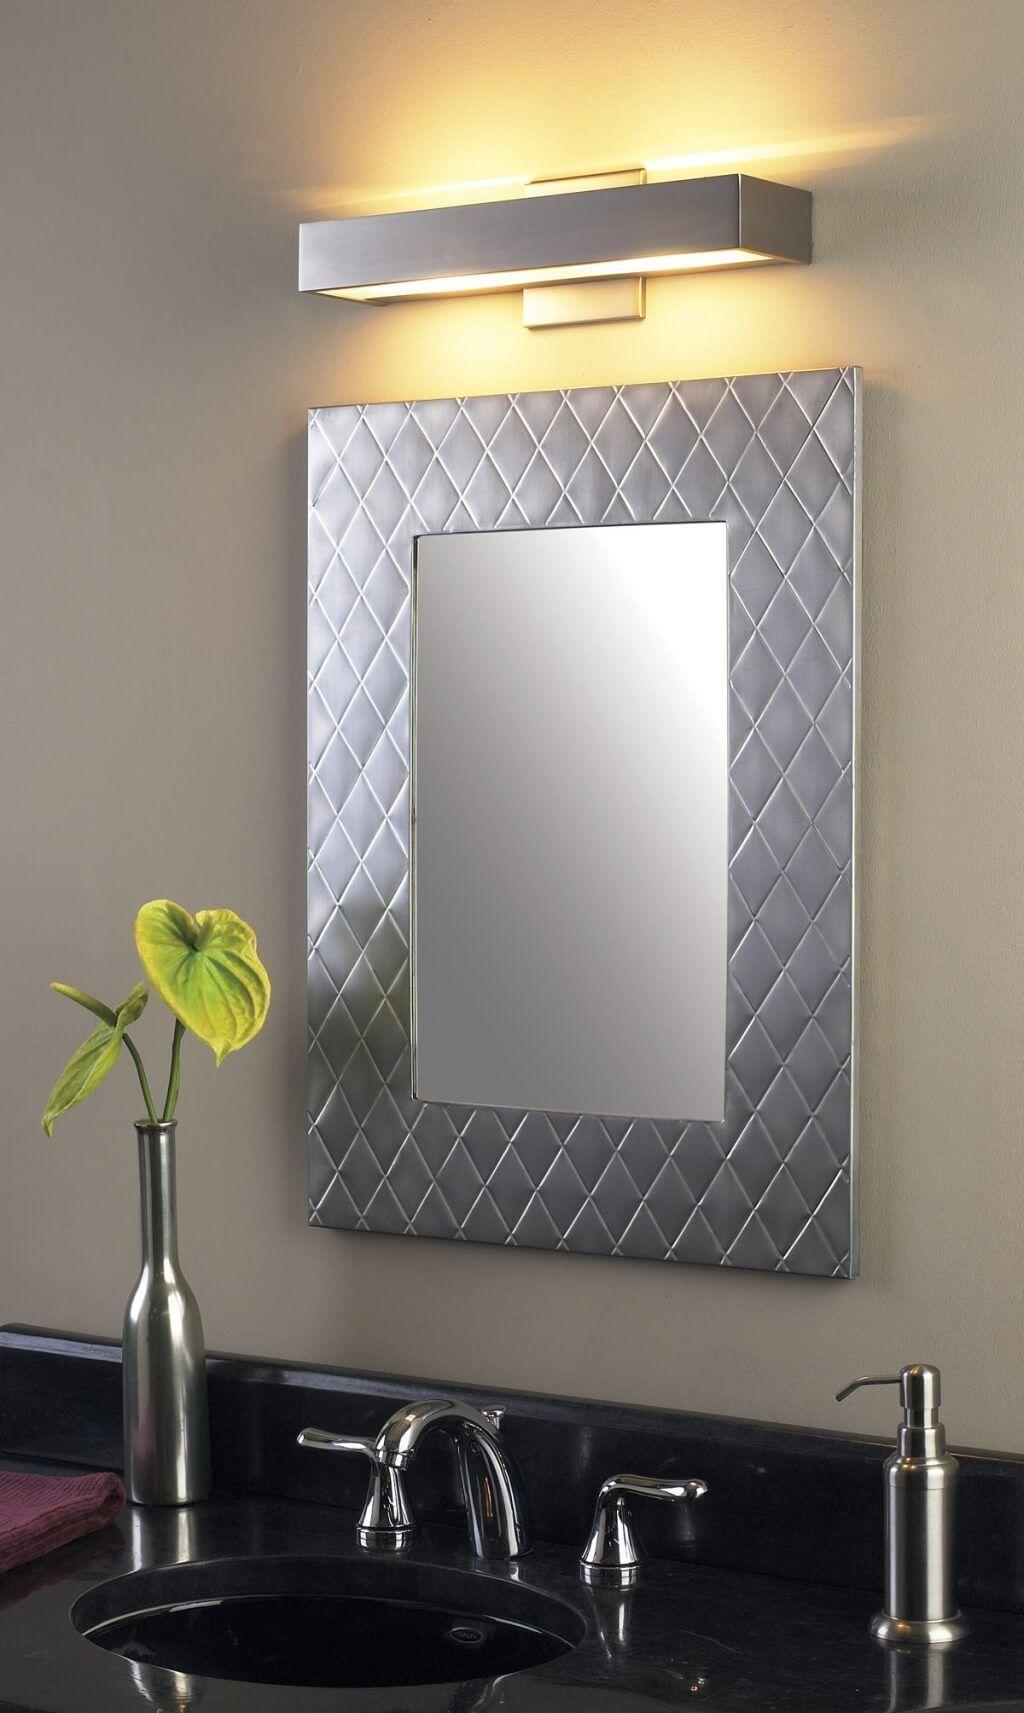 Modern Led Bathroom Vanity Lights Furnitureanddecors Com In 2020 Modern Bathroom Light Fixtures Bathroom Wall Sconces Bathroom Lights Over Mirror